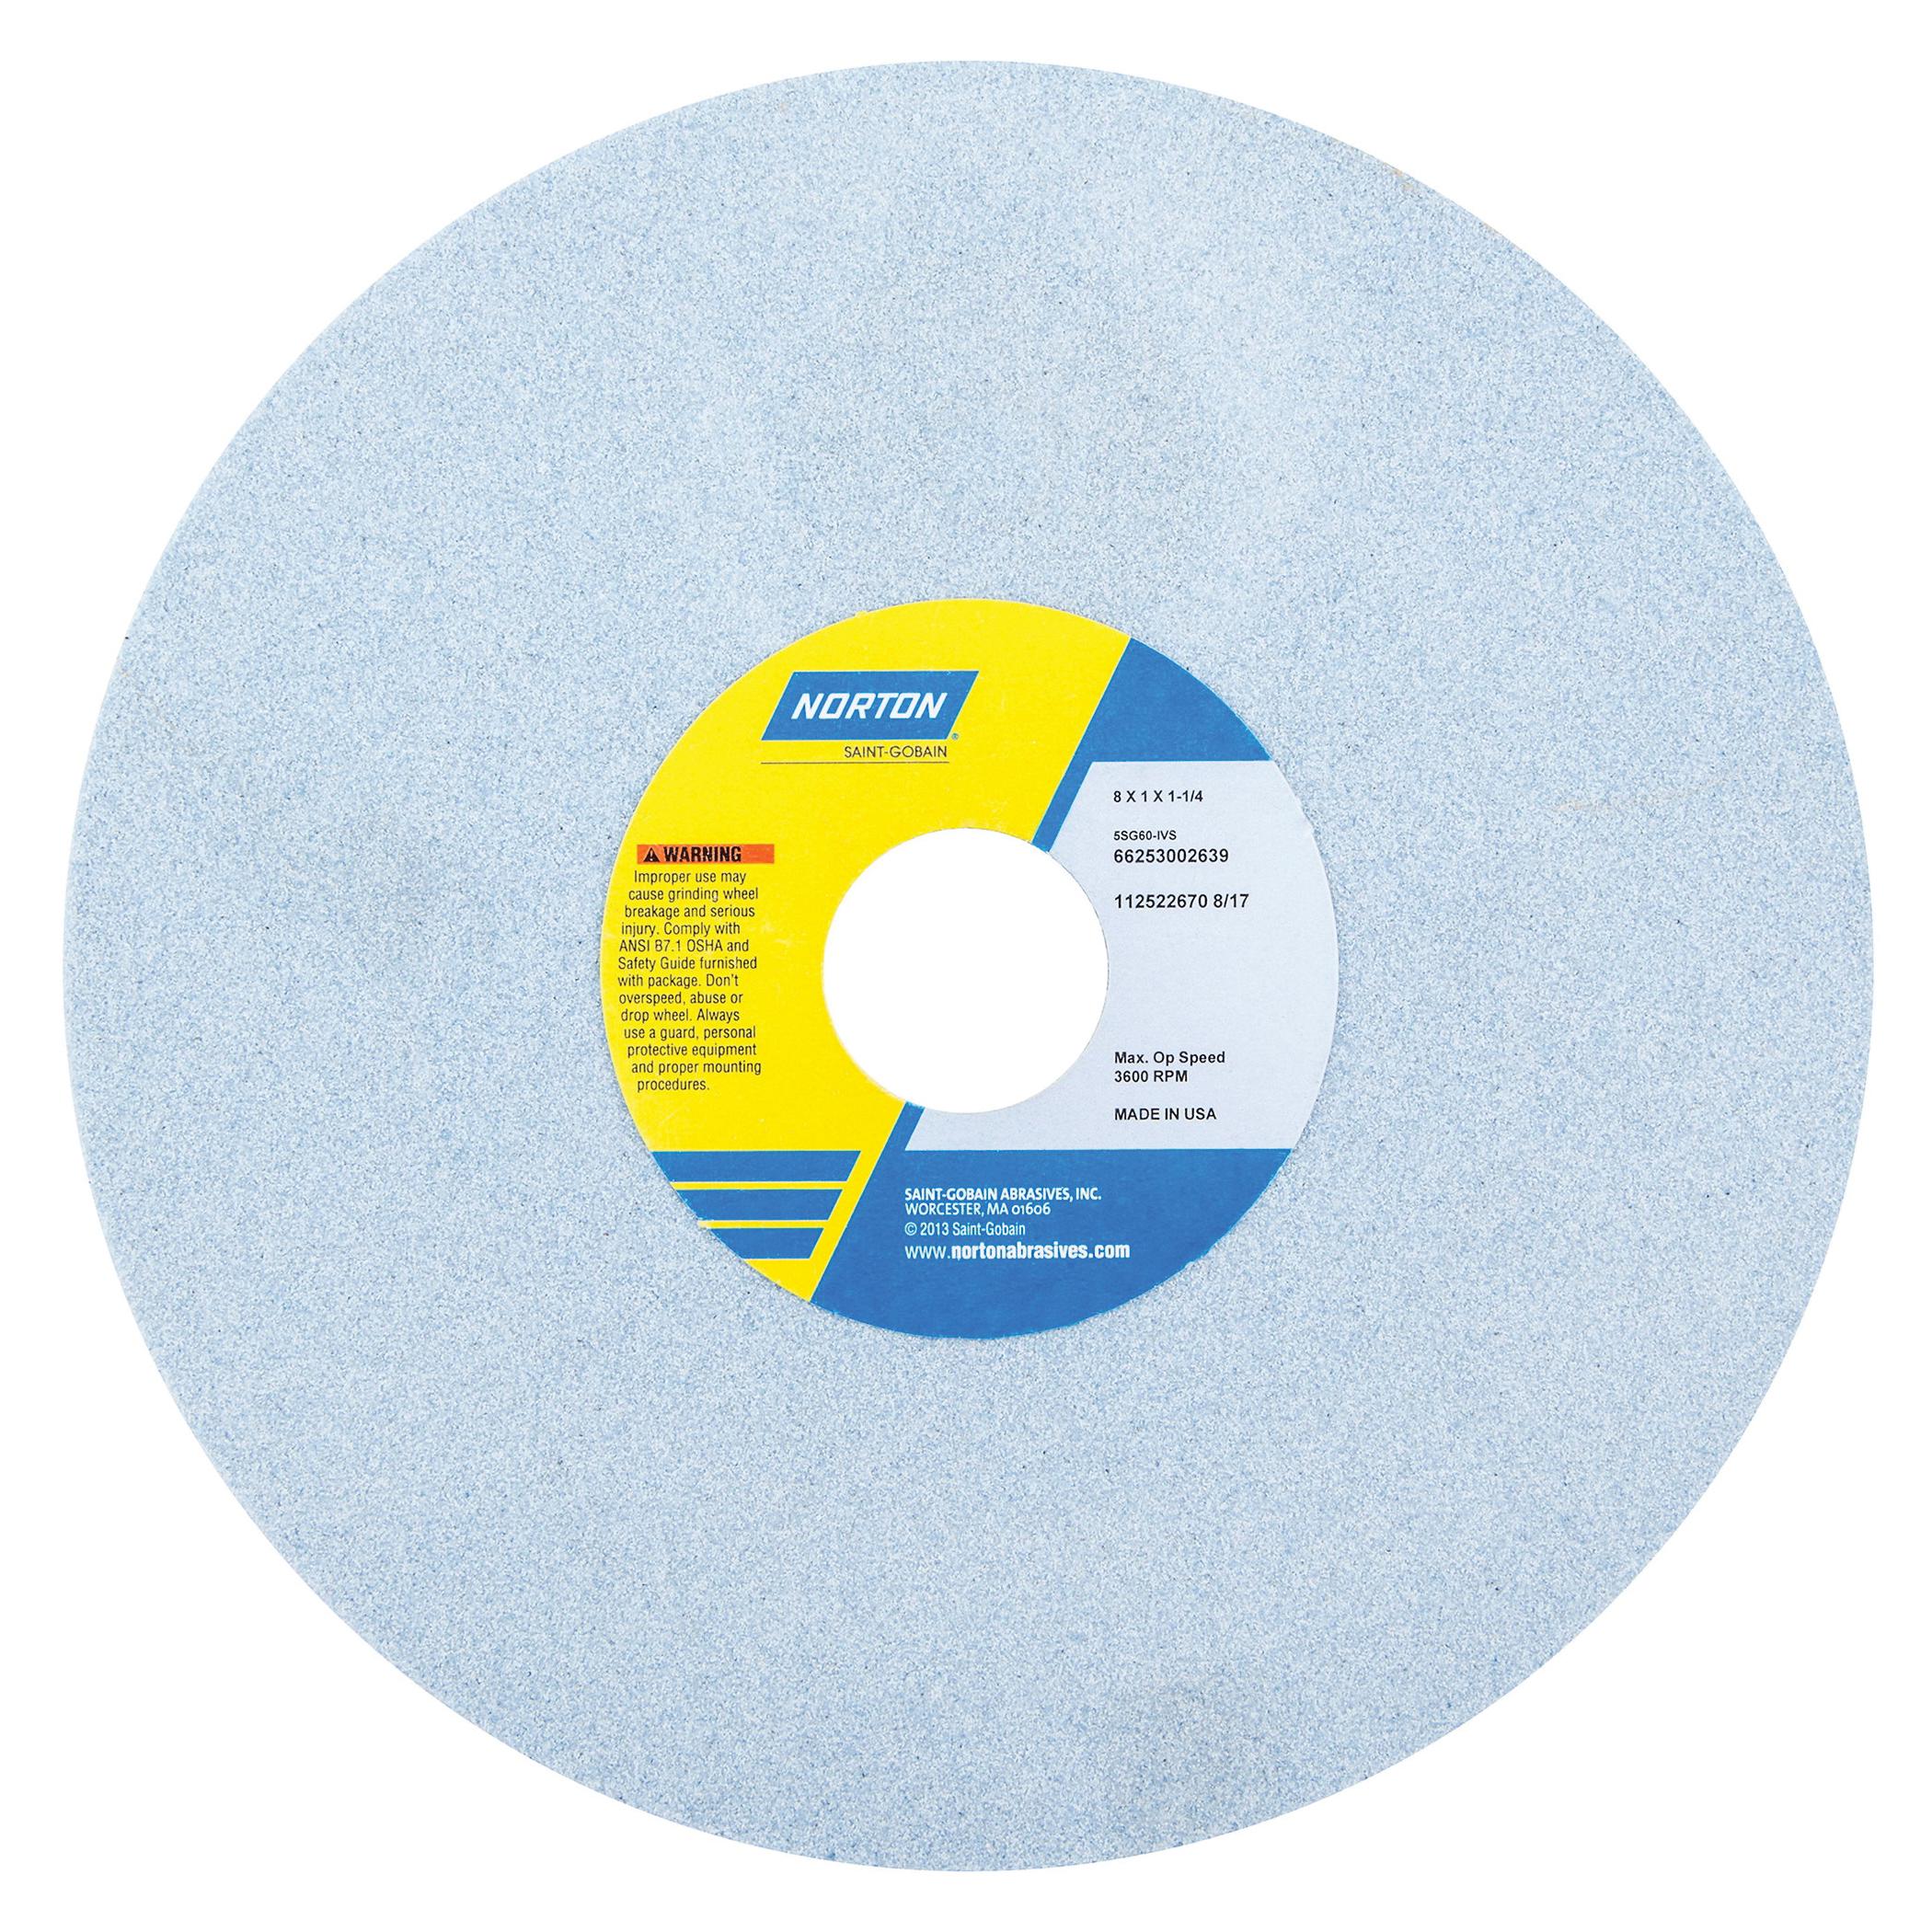 Norton® 66253002588 5SG Straight Toolroom Wheel, 8 in Dia x 1 in THK, 1-1/4 in Center Hole, 46 Grit, Ceramic Alumina/Friable Aluminum Oxide Abrasive